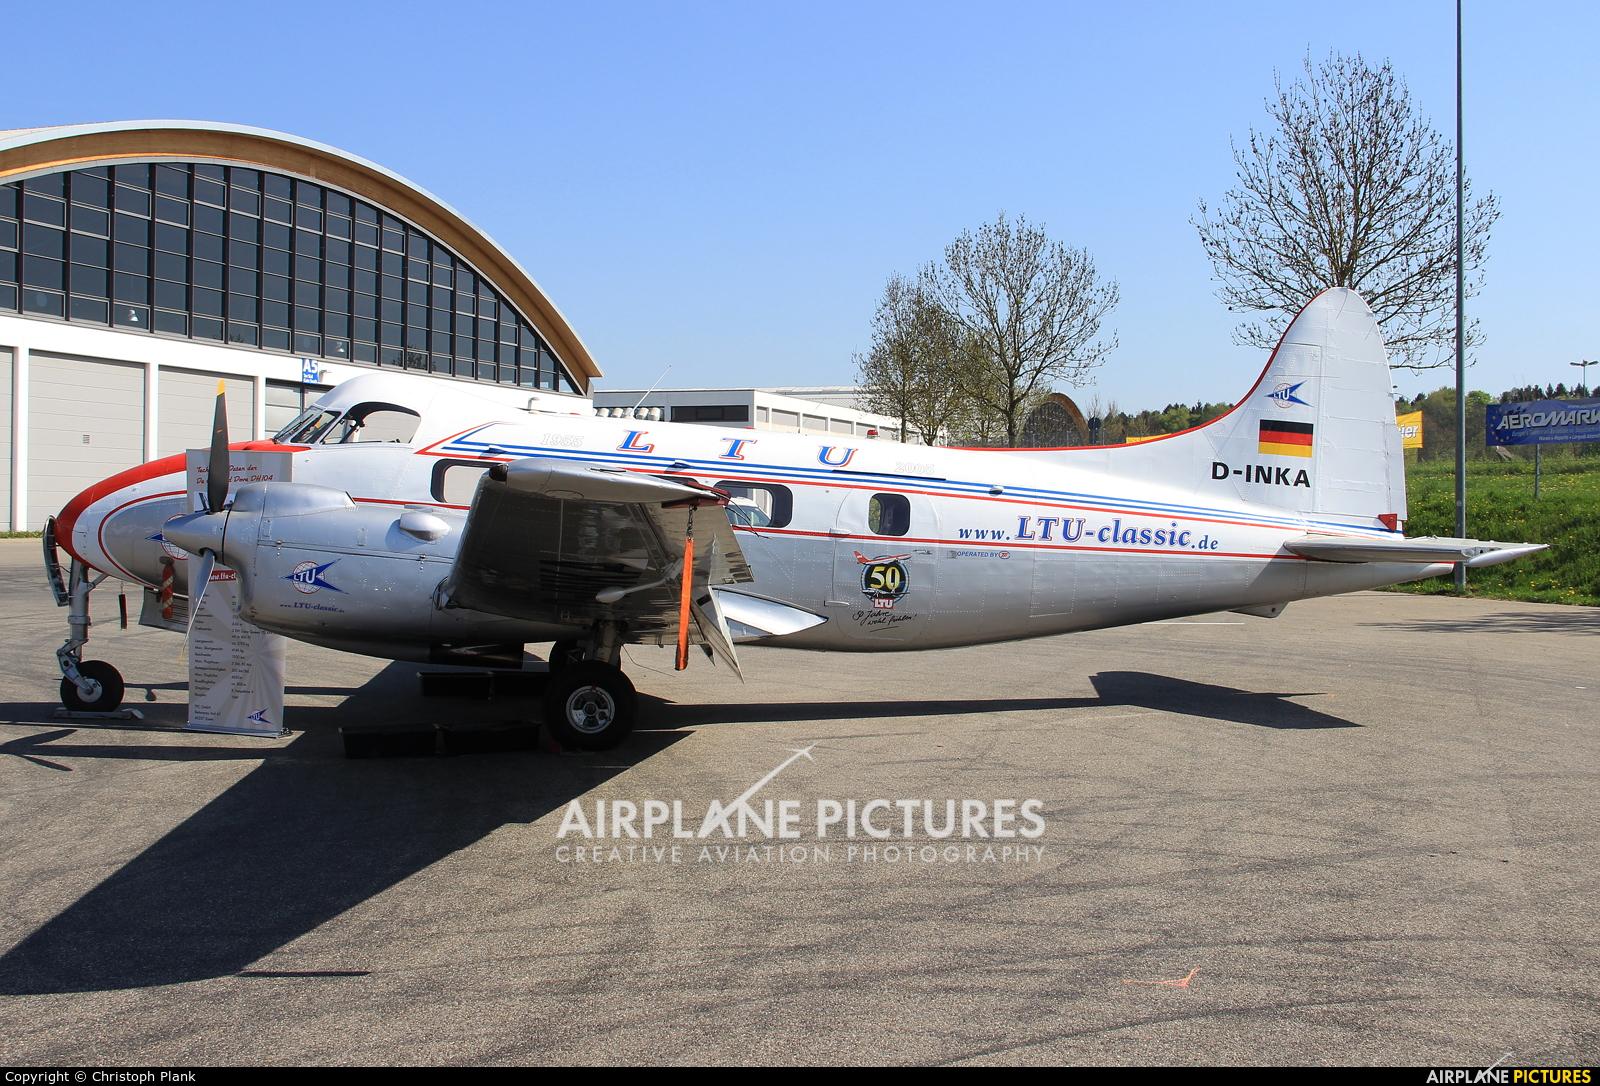 LTU D-INKA aircraft at Friedrichshafen